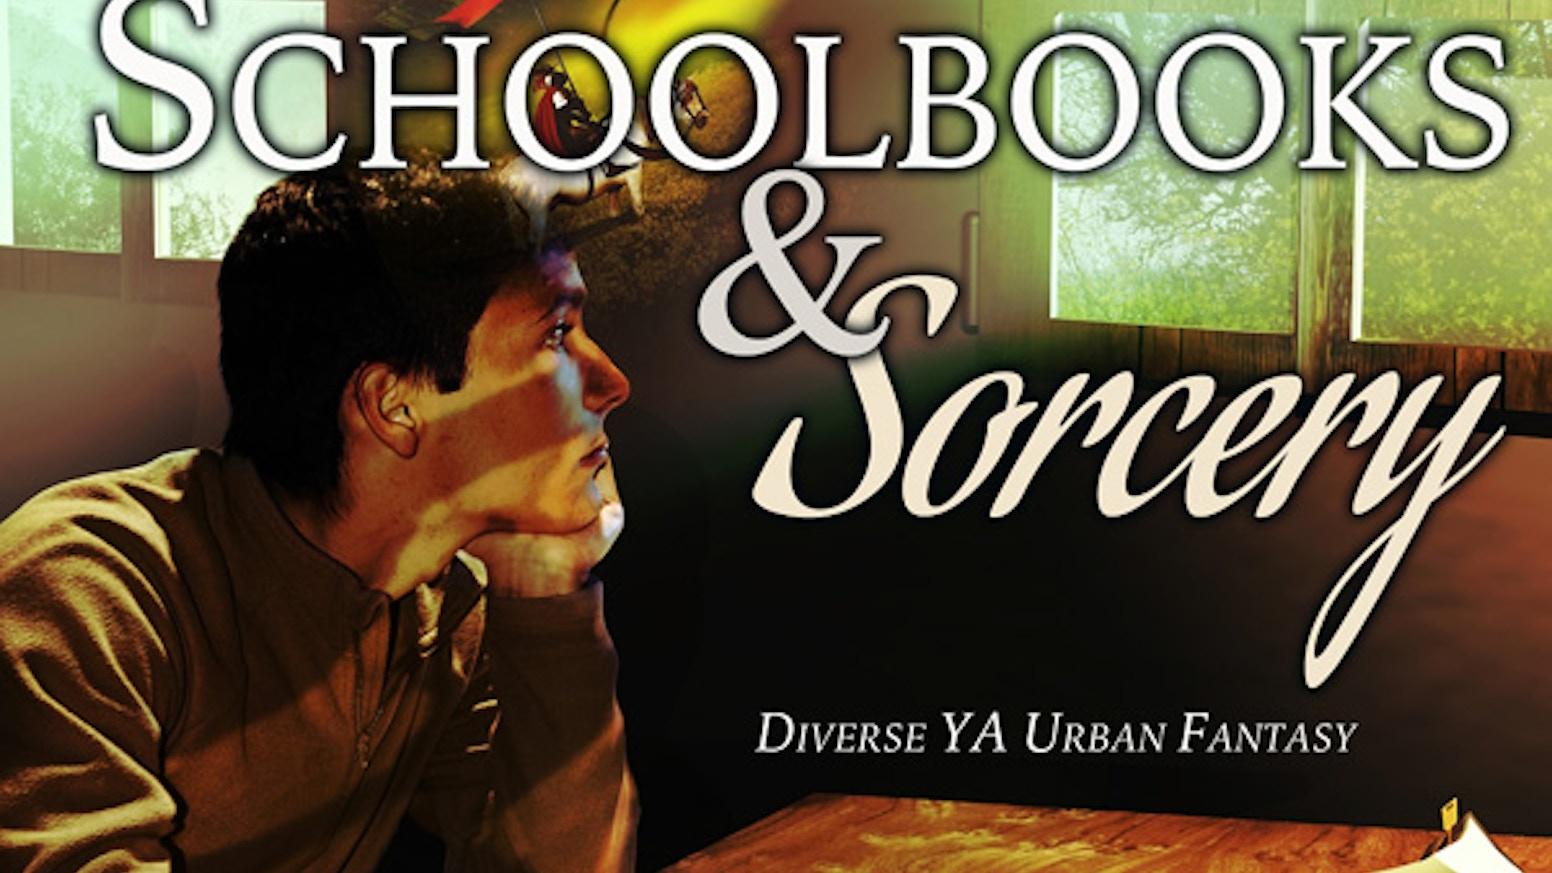 Schoolbooks & Sorcery - LGBTQ-Inclusive YA Anthology by